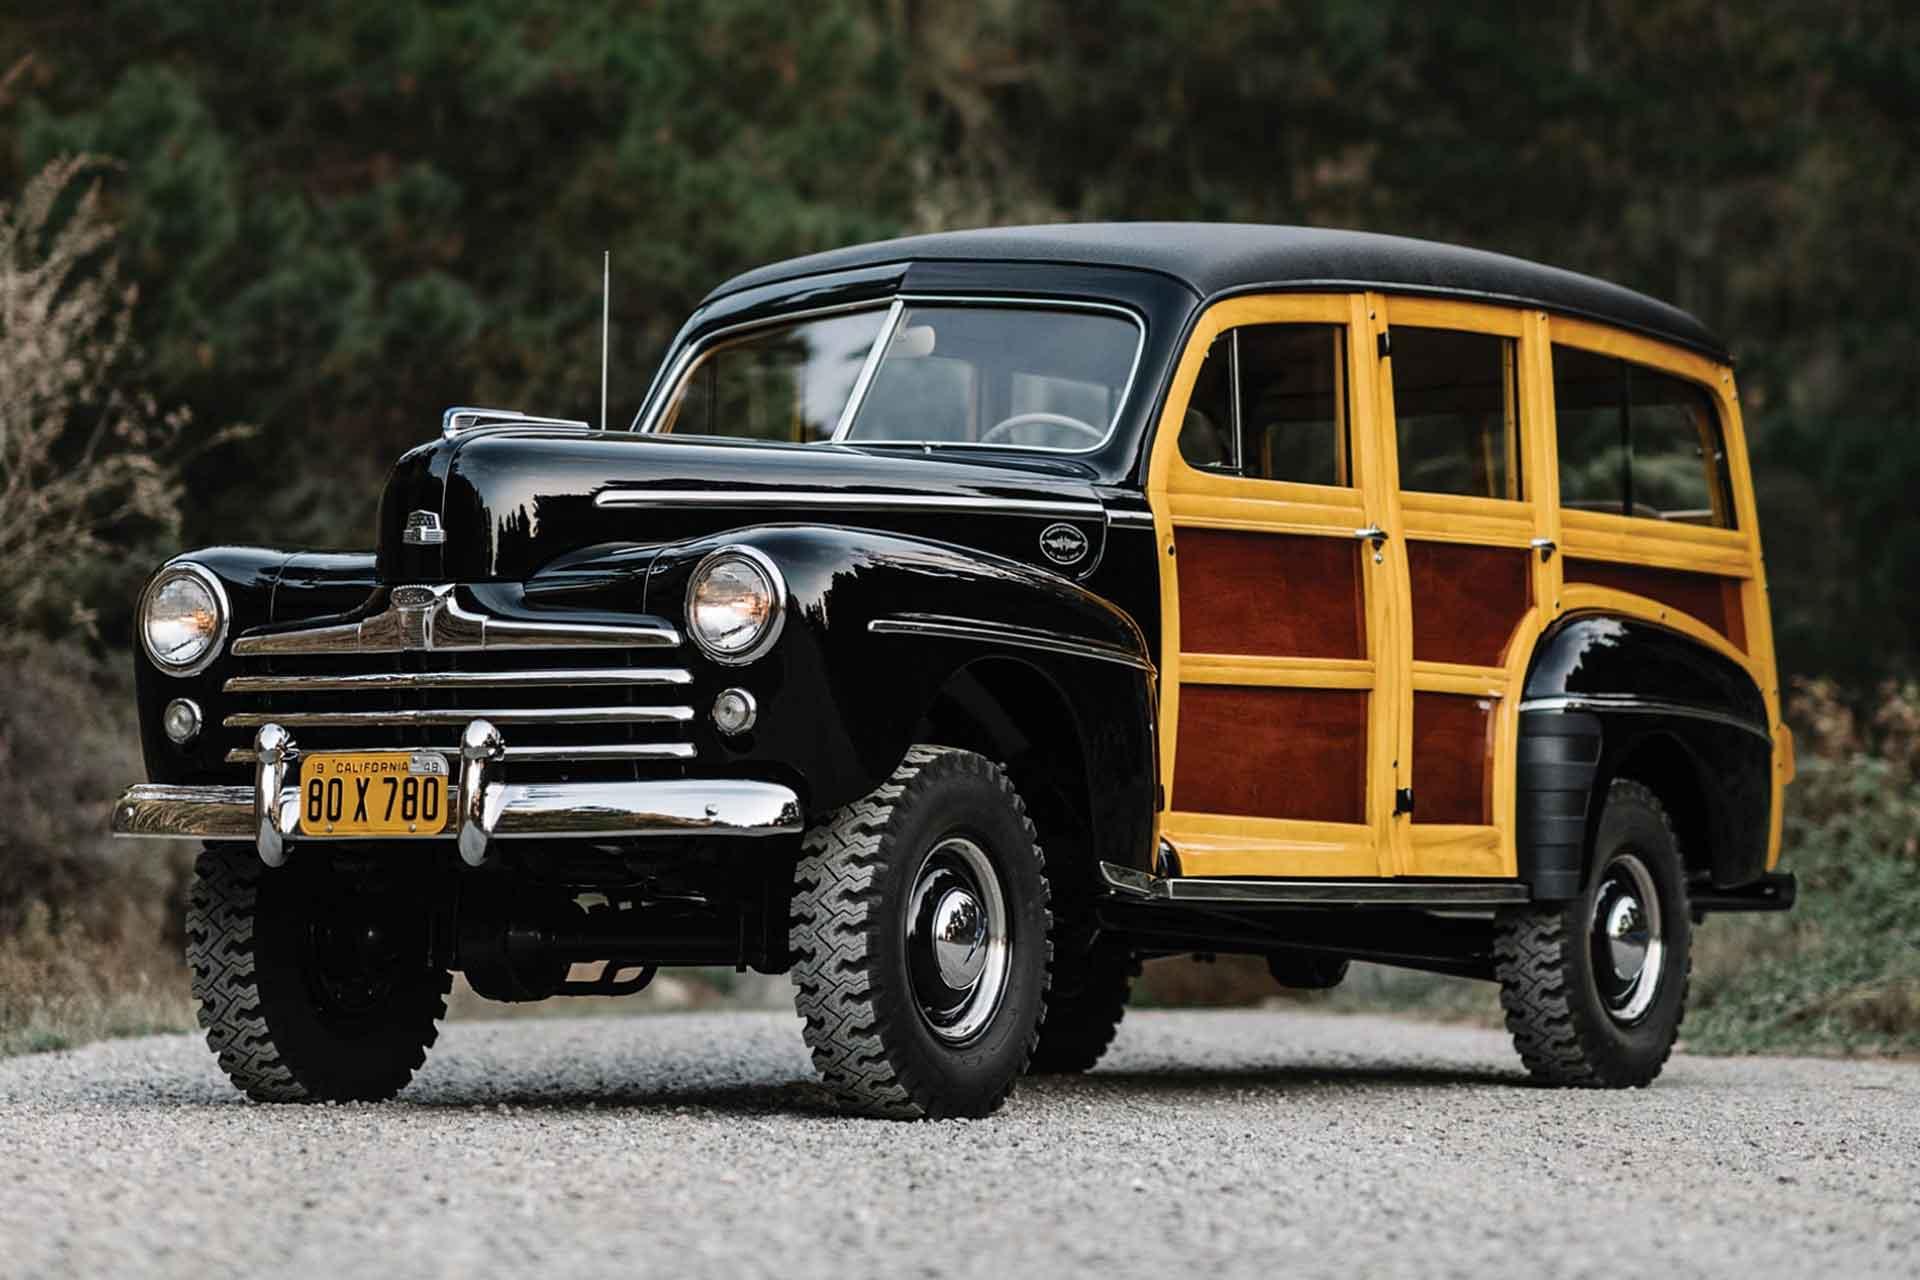 1948 Ford Super Deluxe SUV